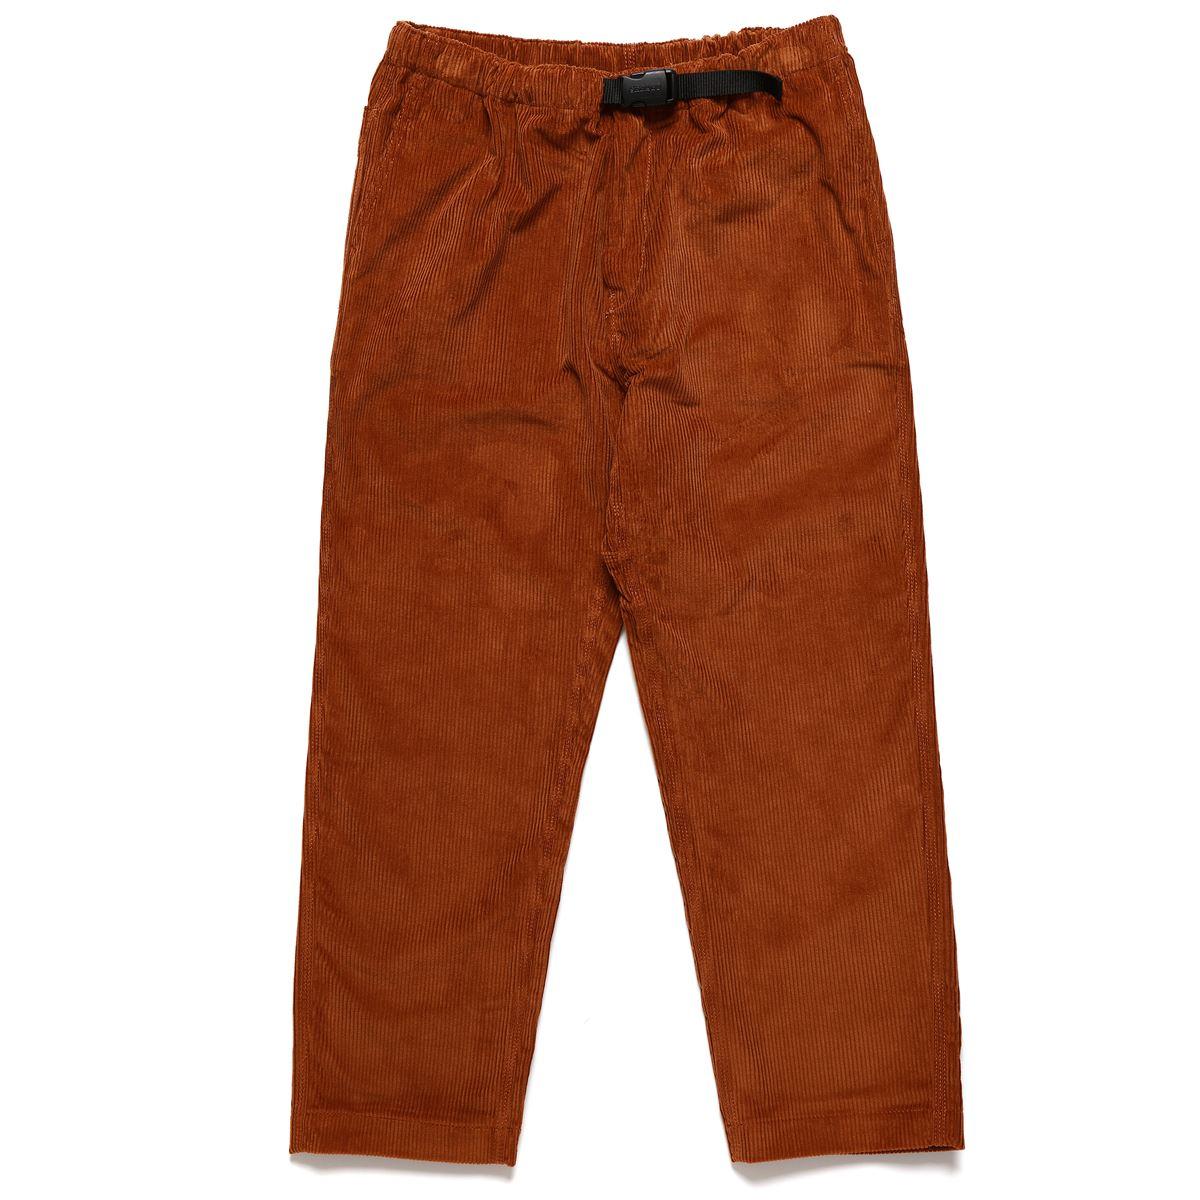 Sebago Pantaloni uomo-71119ZW